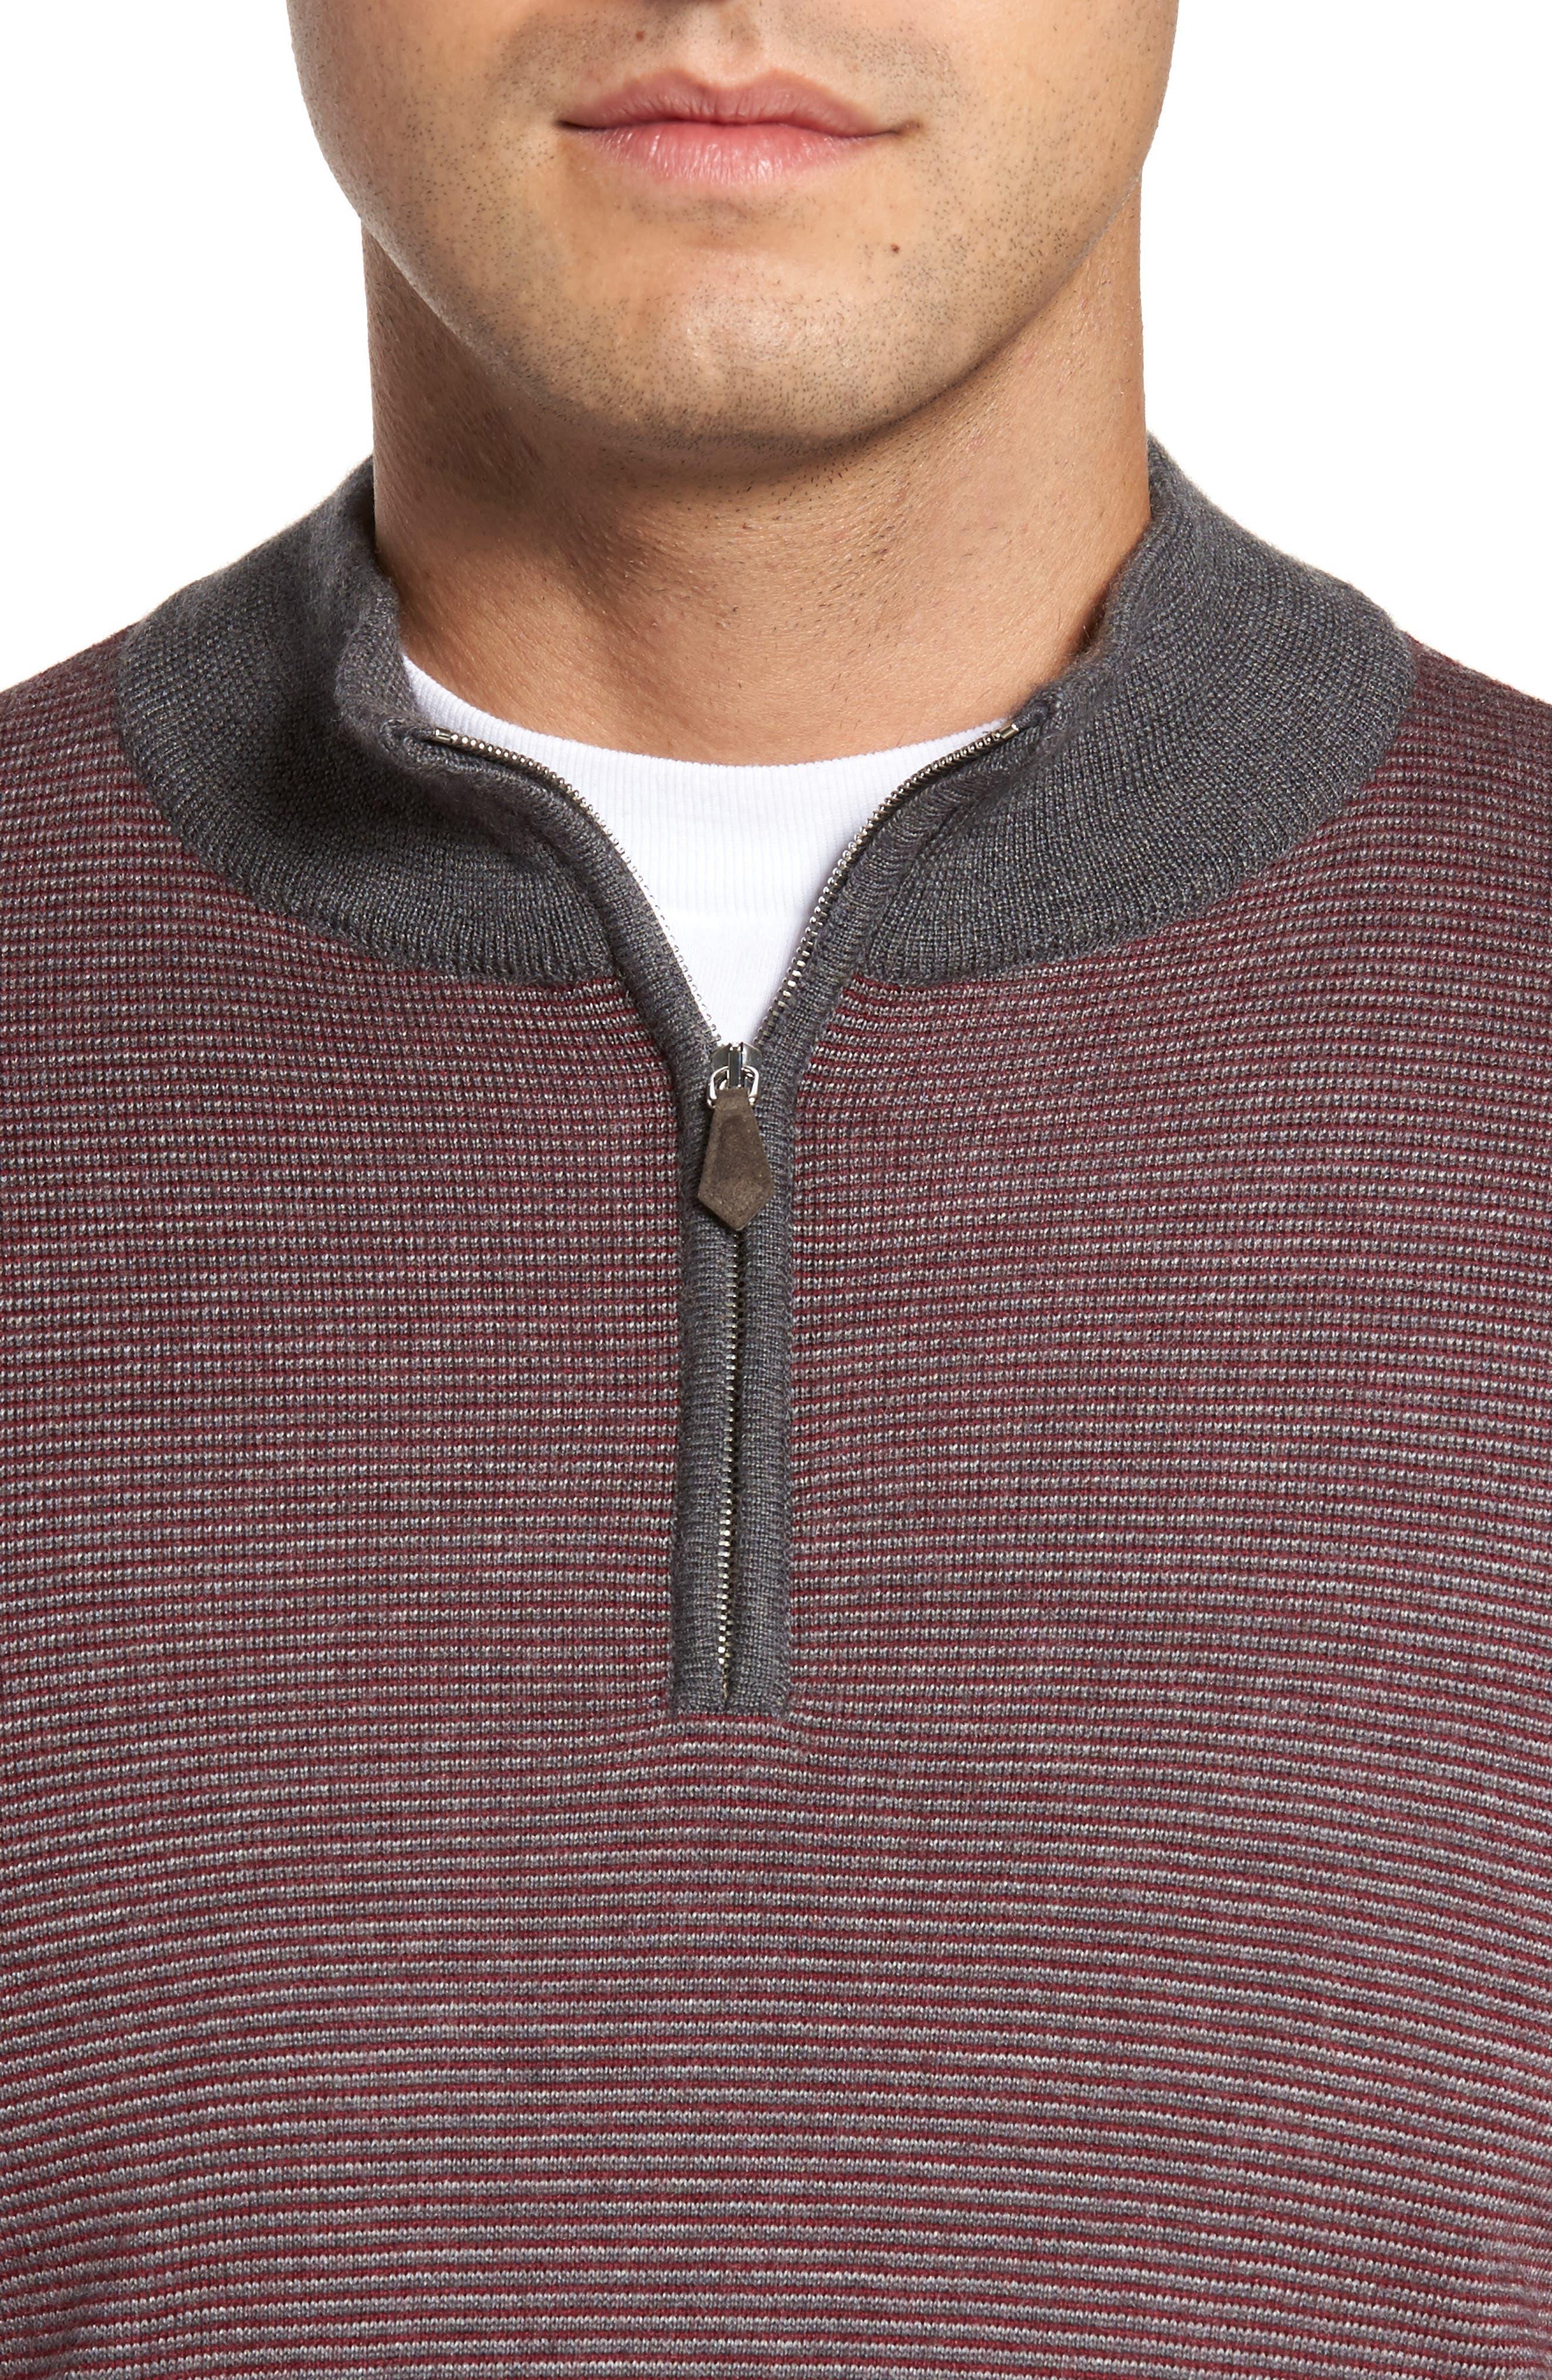 Trichrome Stripe Merino Wool Blend Sweater,                             Alternate thumbnail 4, color,                             930